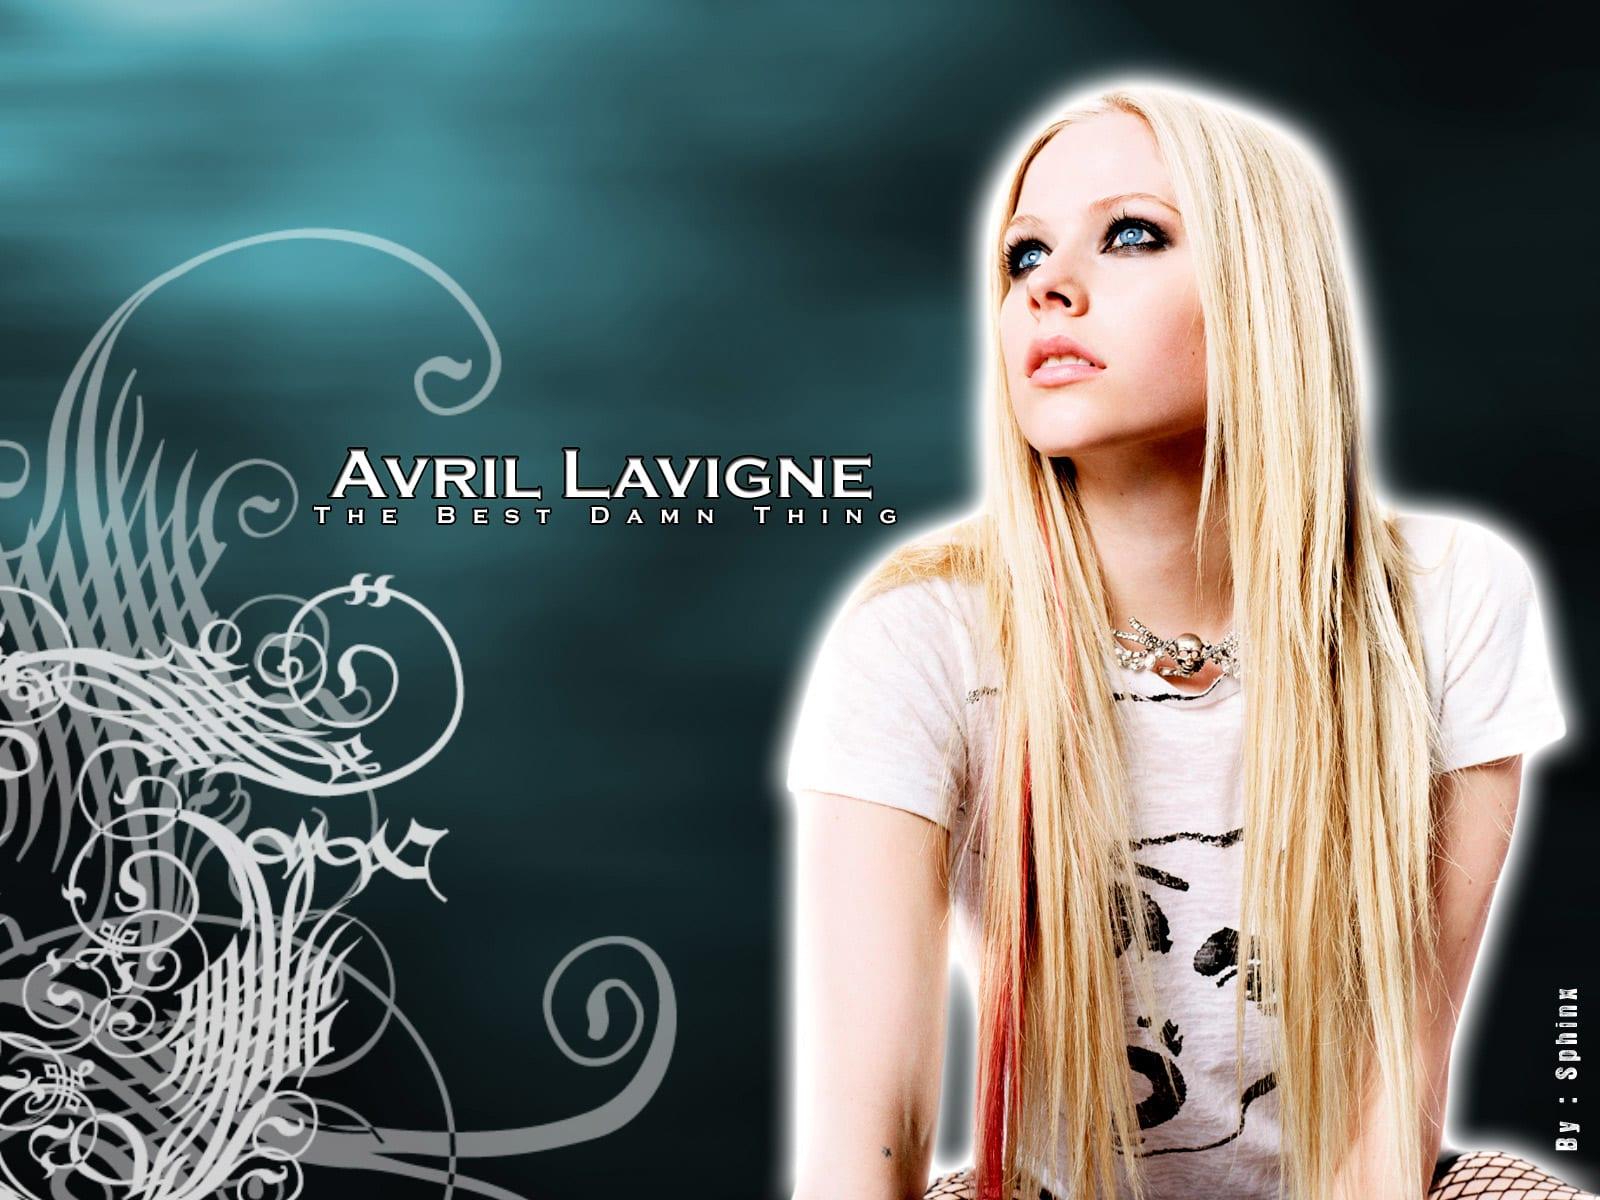 Avril lavigne 3the best damn thing20074171 voltagebd Gallery